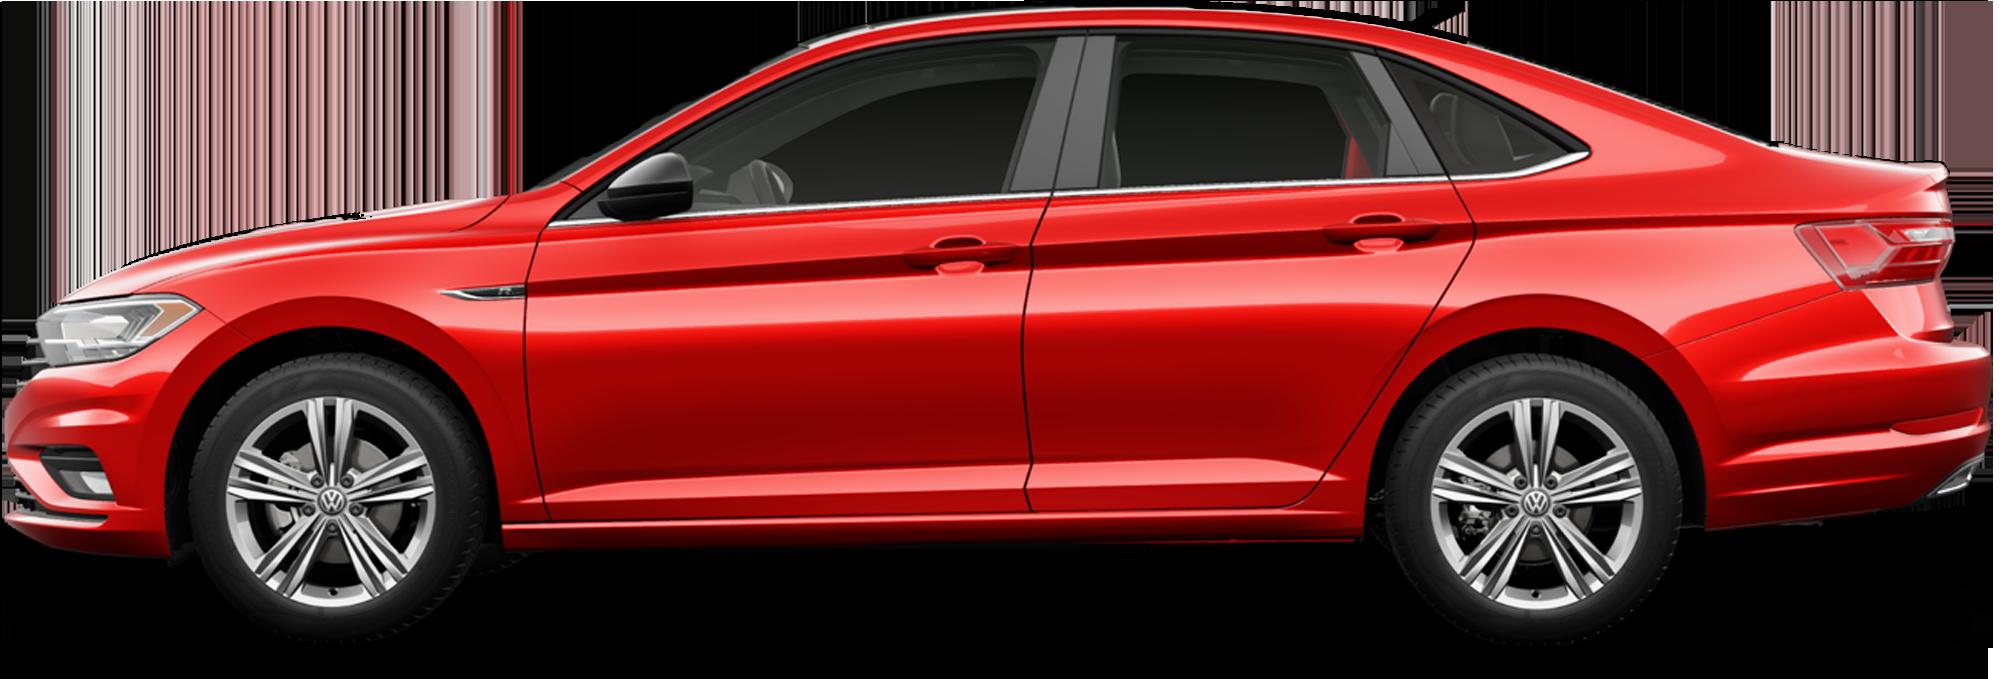 2020 Volkswagen Jetta Sedan 1.4T R-Line w/SULEV